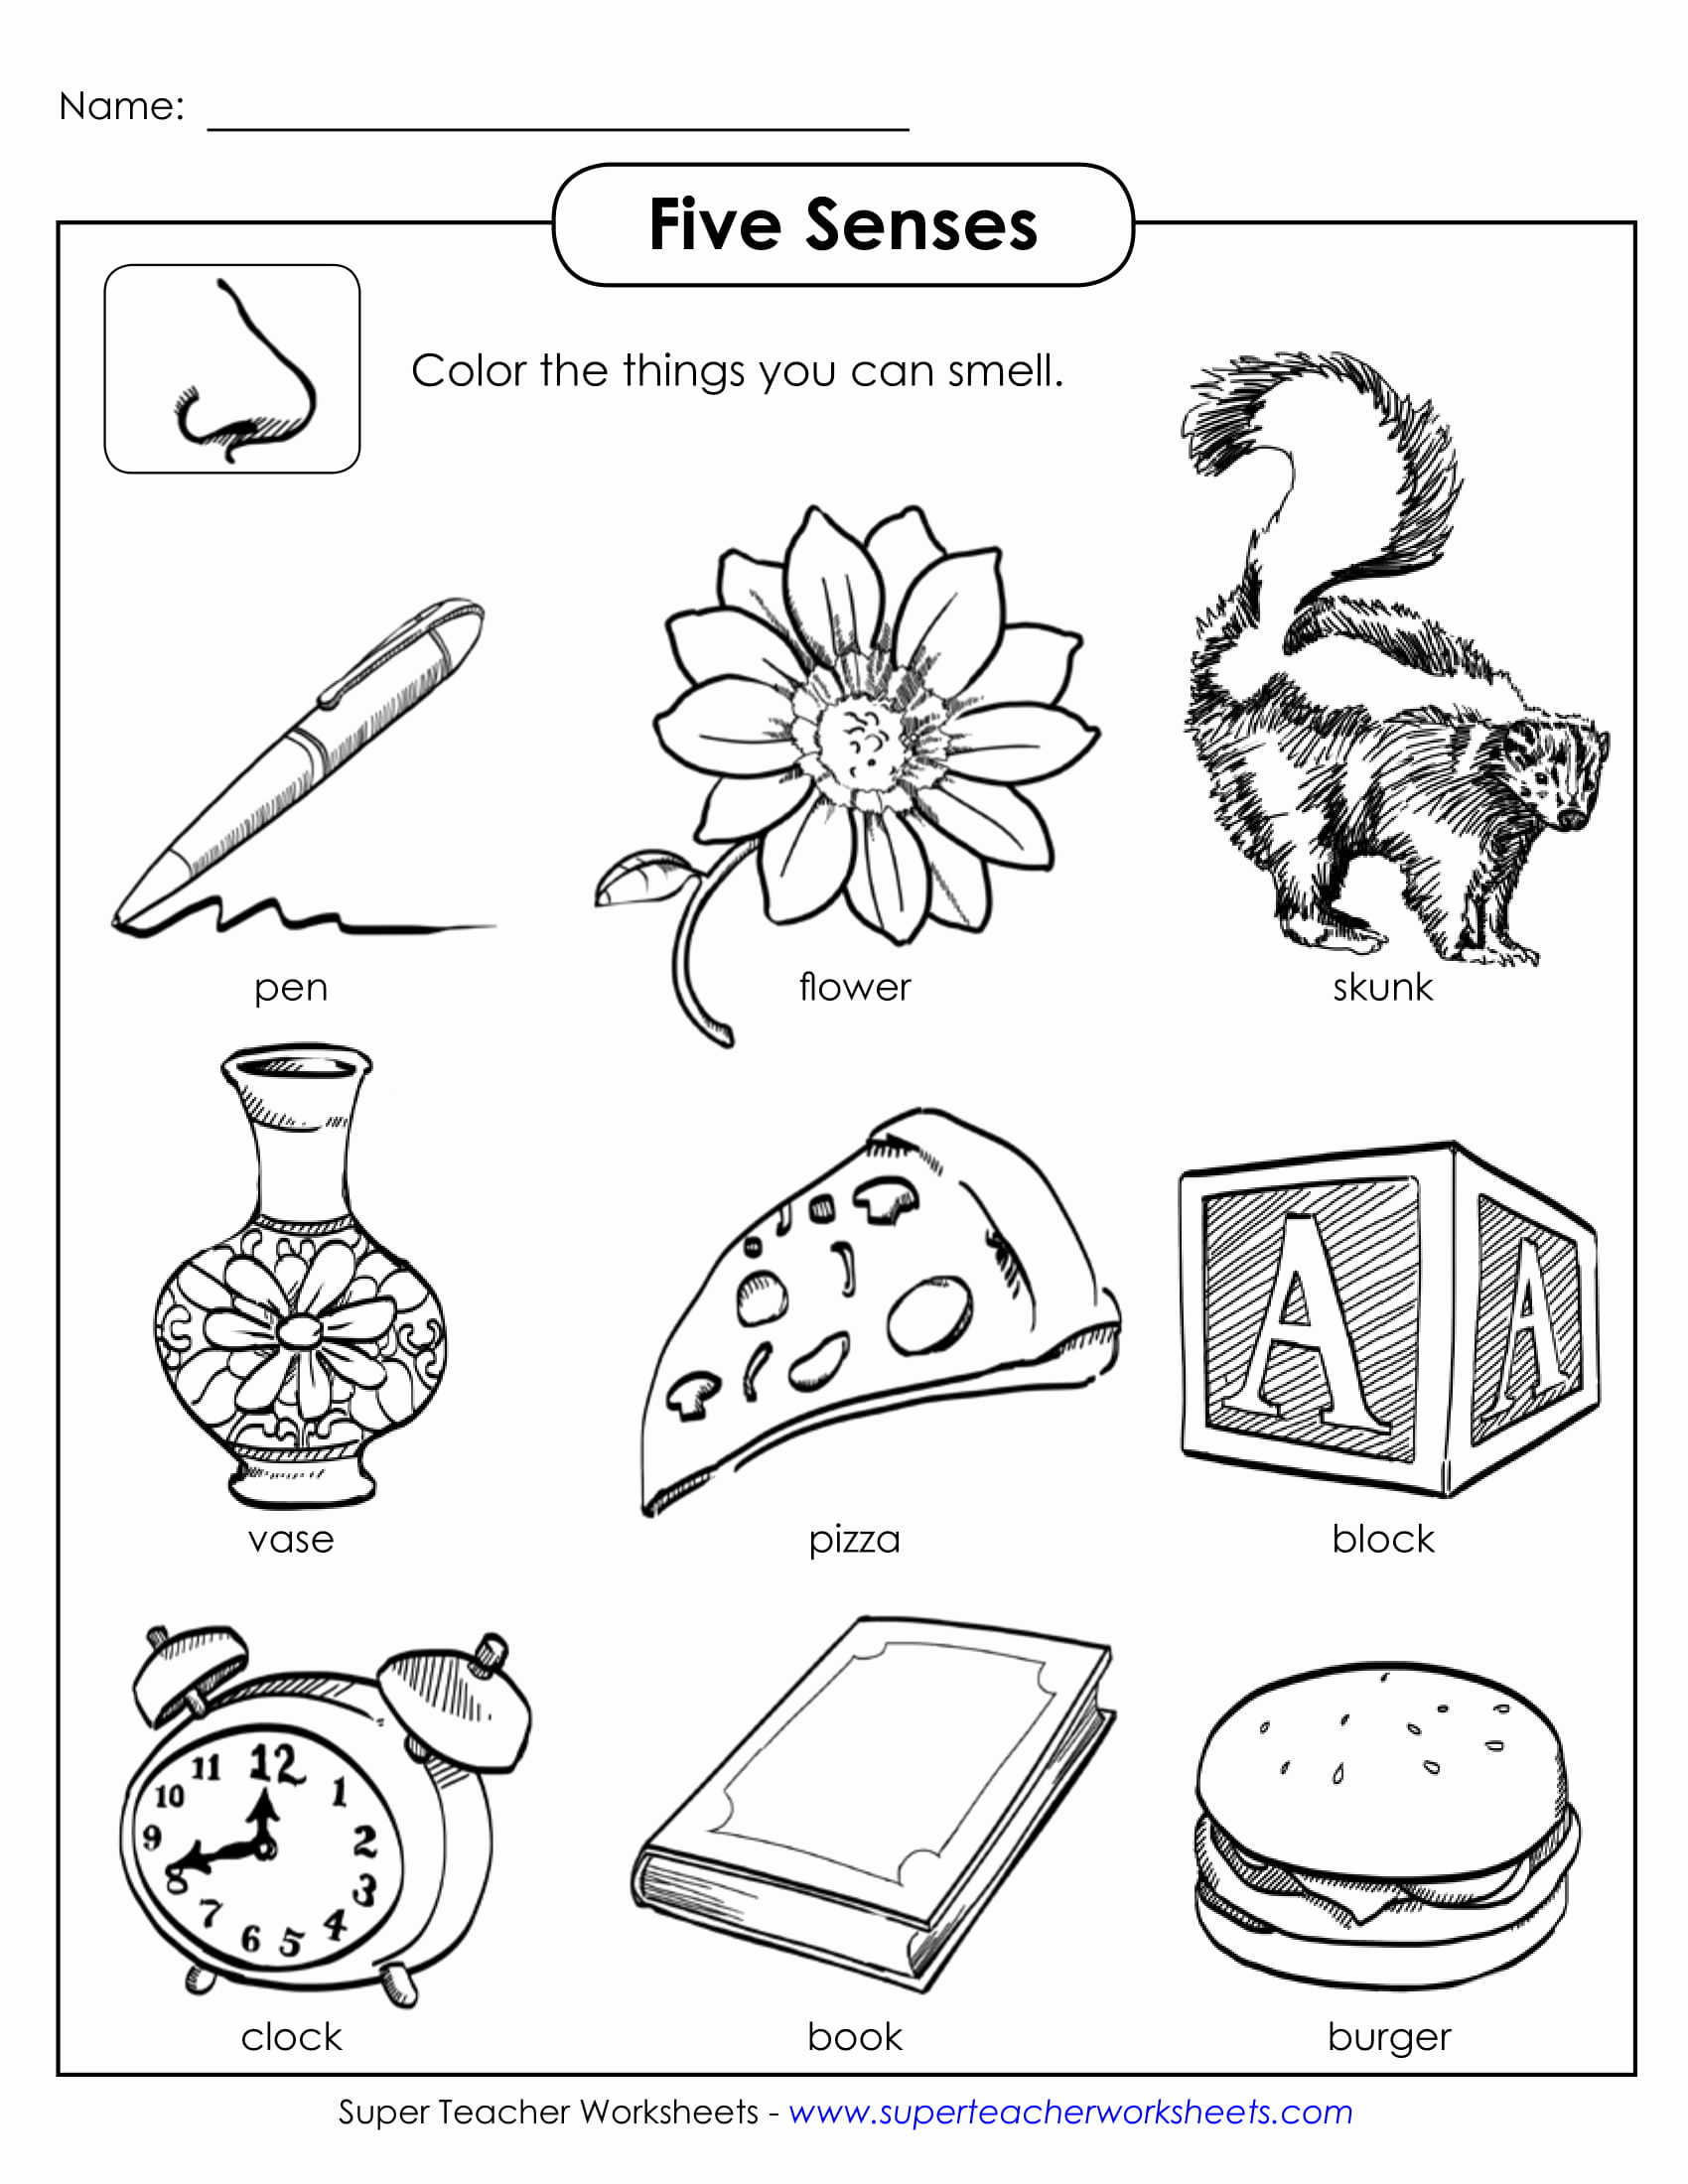 5 Senses Worksheets Pdf Lovely 5 Science Worksheets Examples for Students Pdf